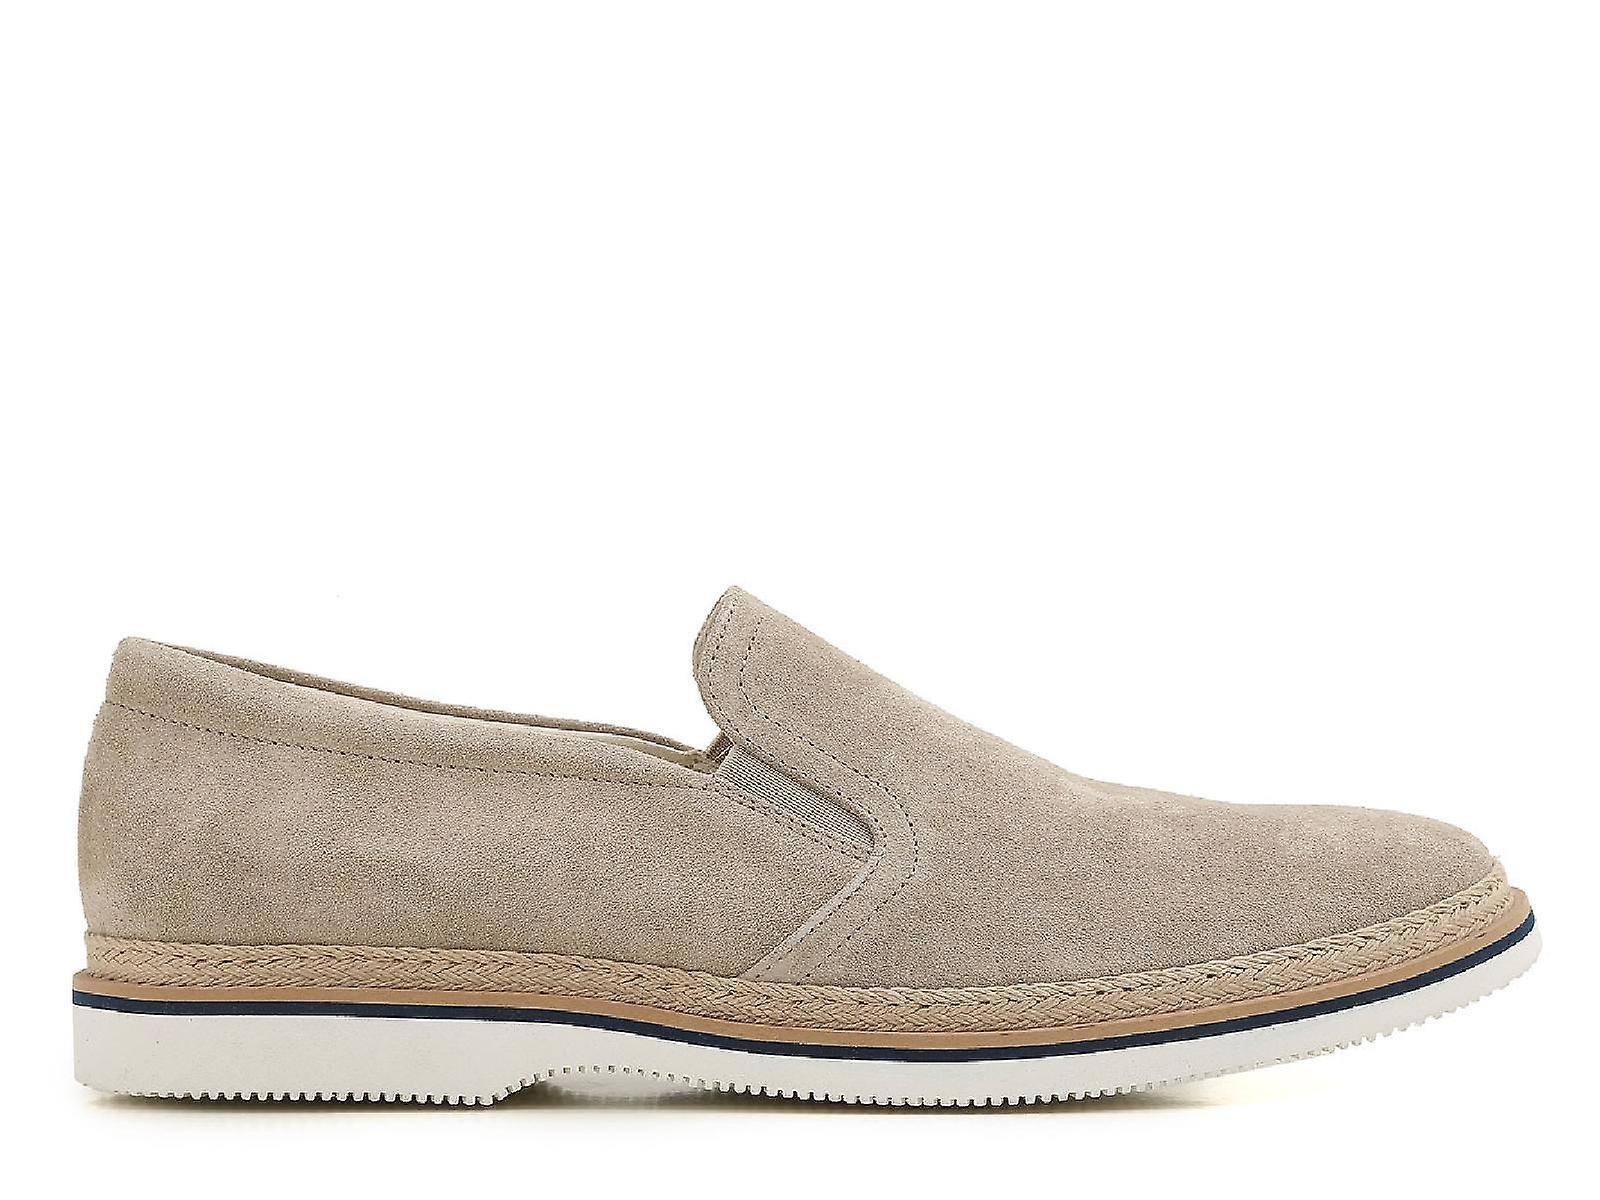 hogan chaussures les mocassins des chaussures hogan en daim beige feuillet ons d99715